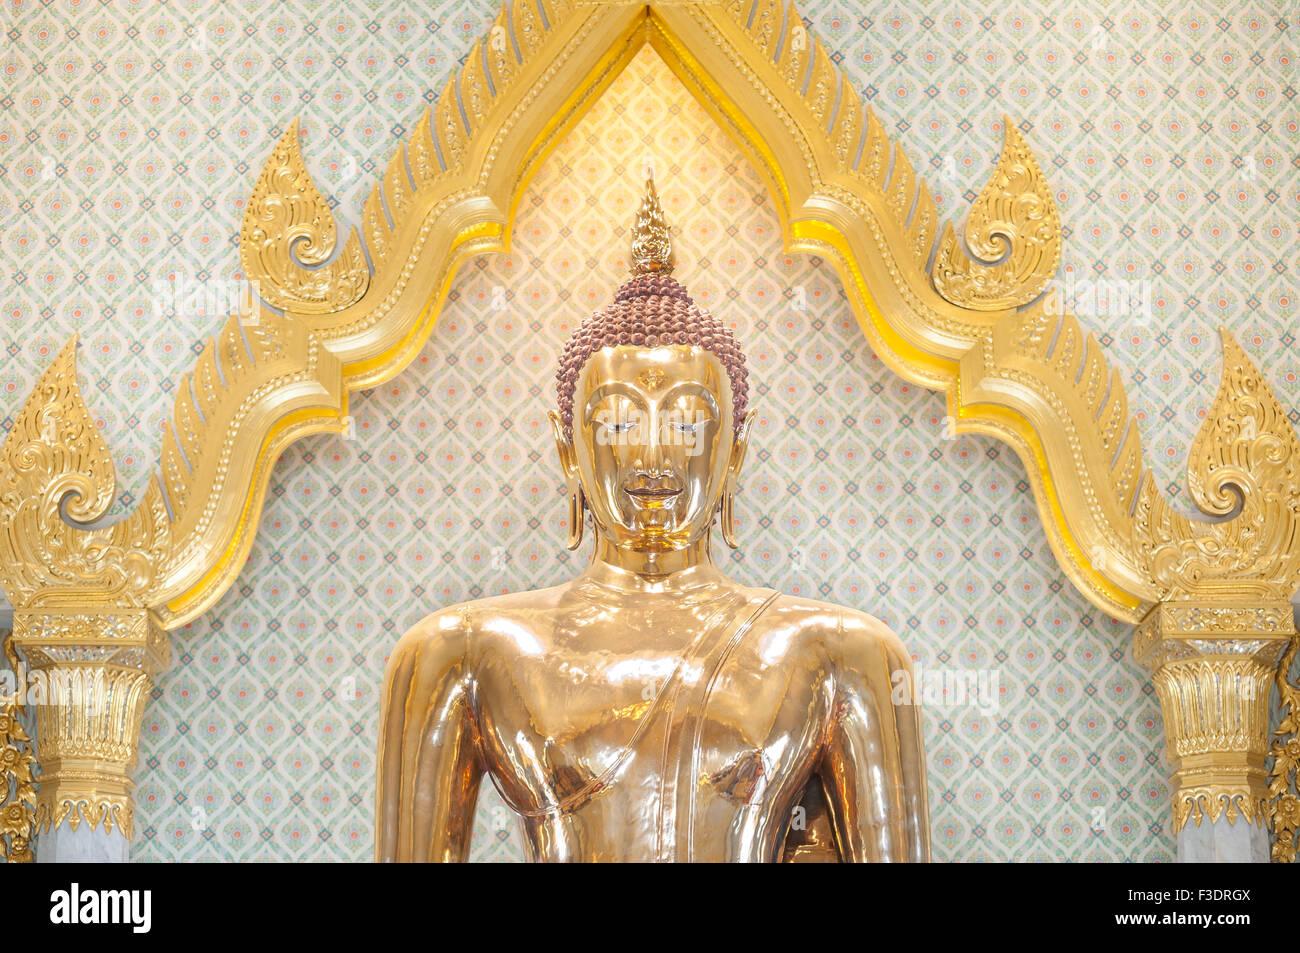 La plus grande statue de Bouddha en or massif dans le monde entier, Wat Traimit, Bangkok, Thaïlande Photo Stock